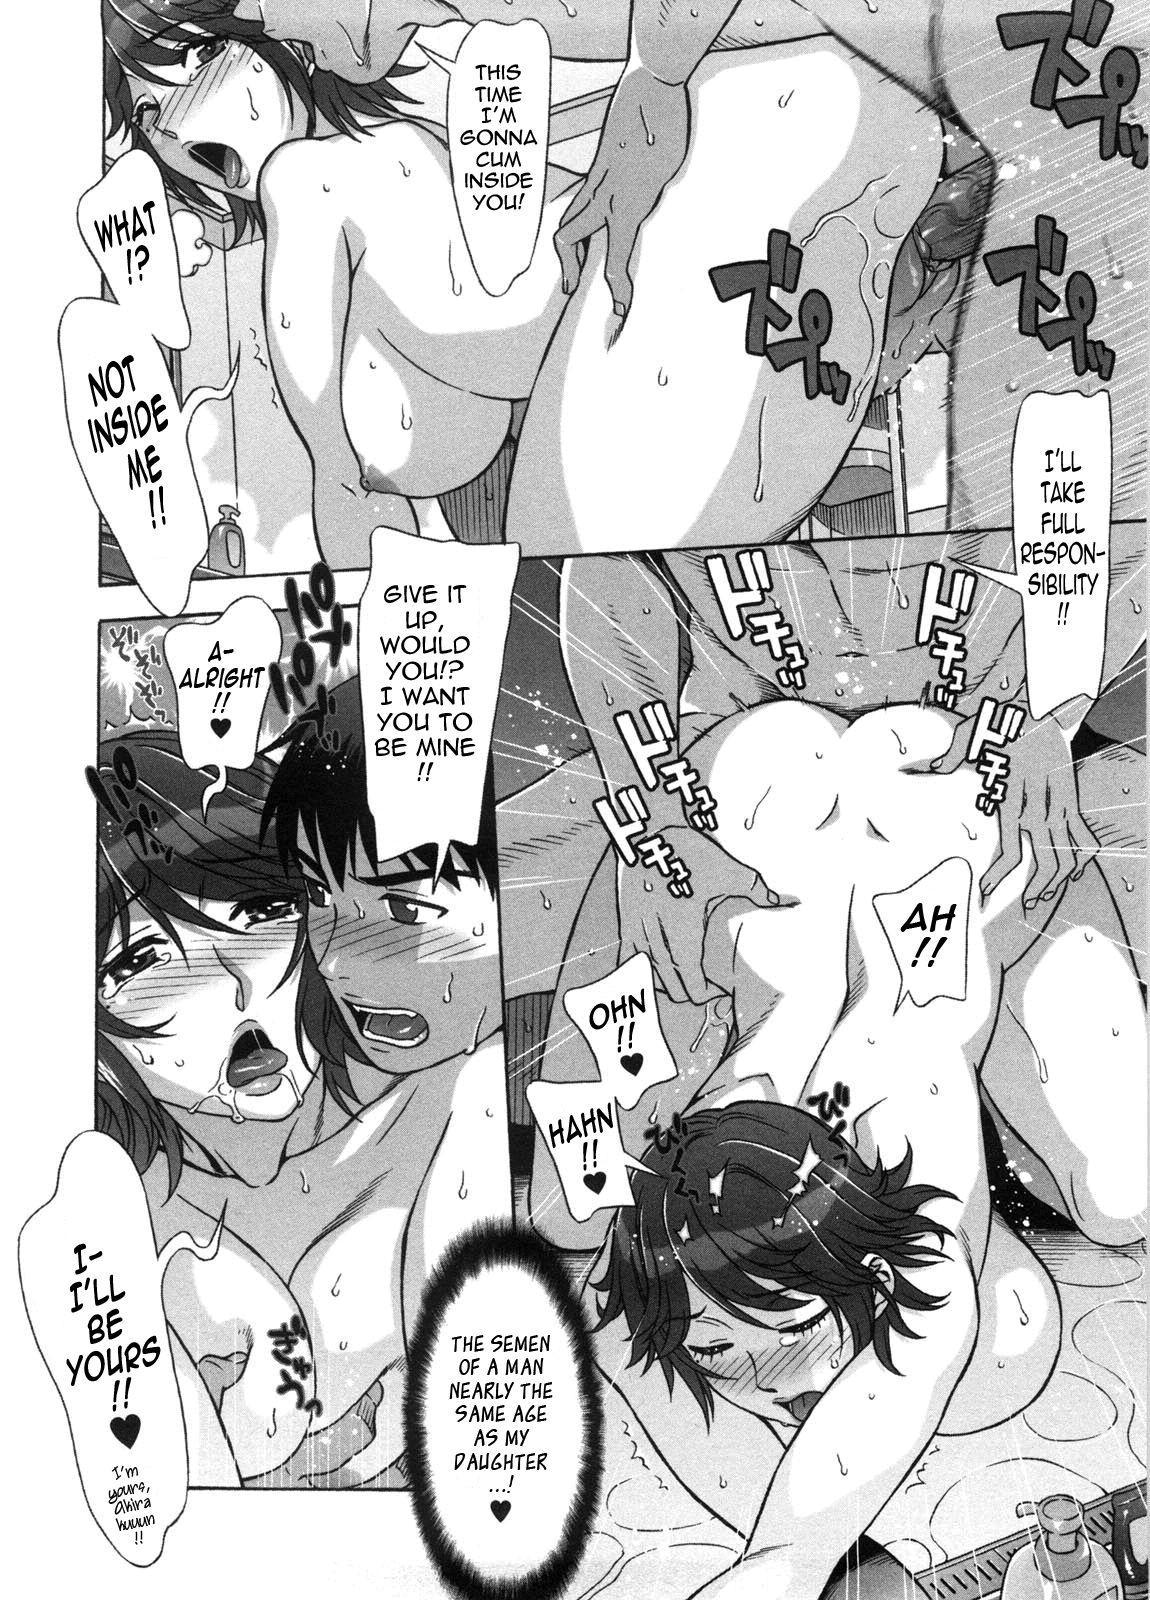 [Hanzaki Jirou] Ama Ero - Sweet Sugar Baby Ch. 1-3 [English] [Tadanohito] [Decensored] 56